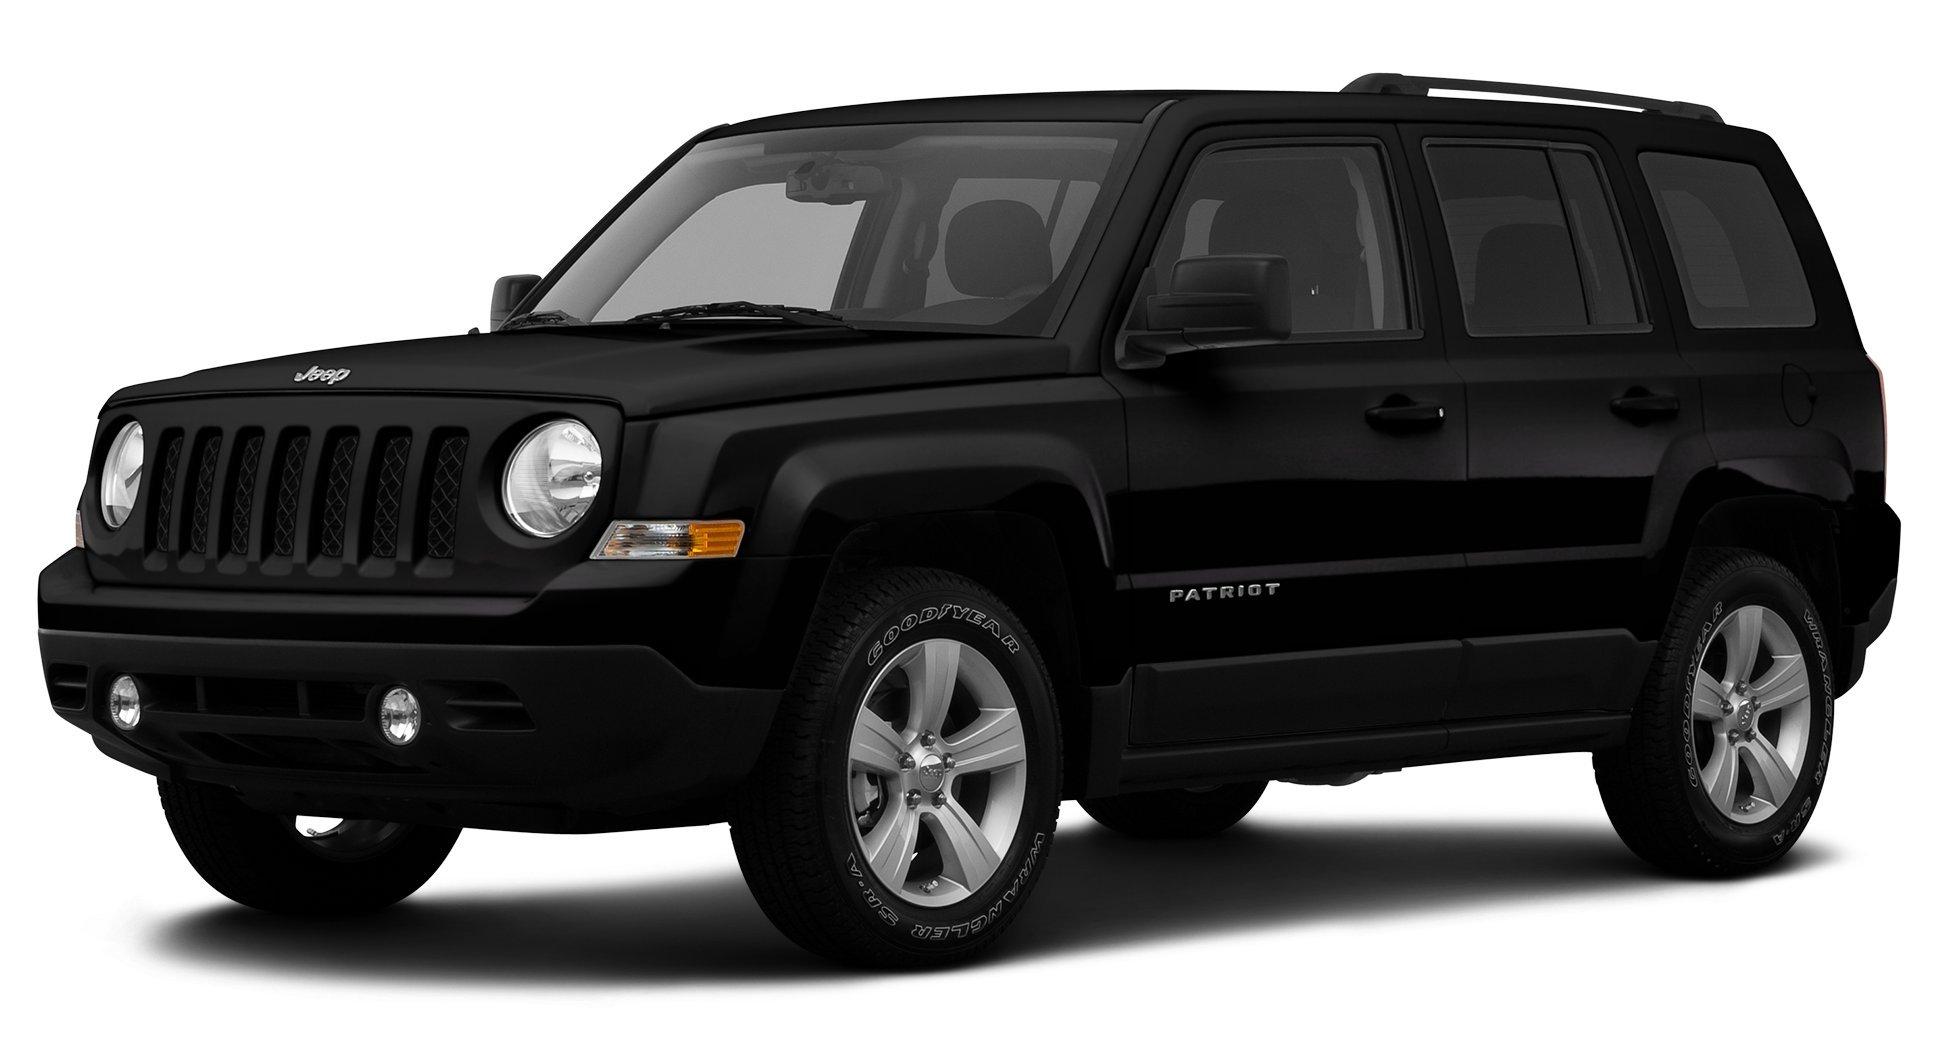 2021 Jeep Patriot Ratings